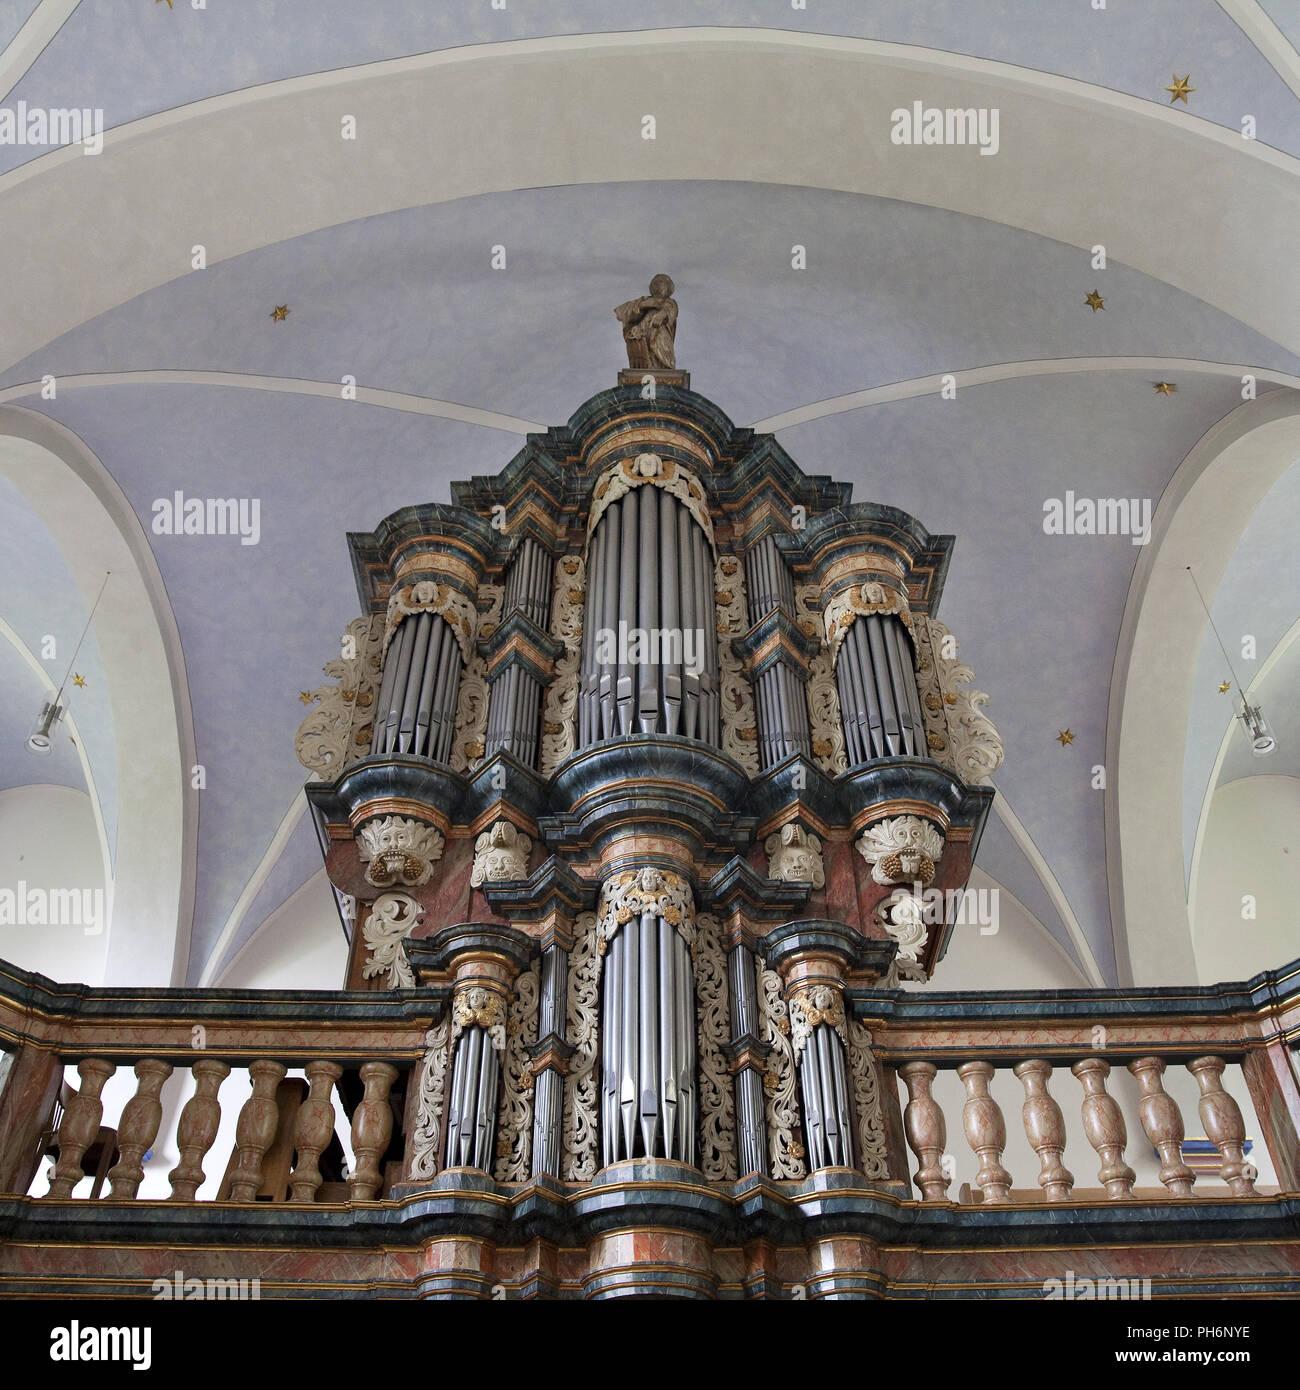 Orgel, St. Pankratuis Kirche, Bötzow, Deutschland Stockbild